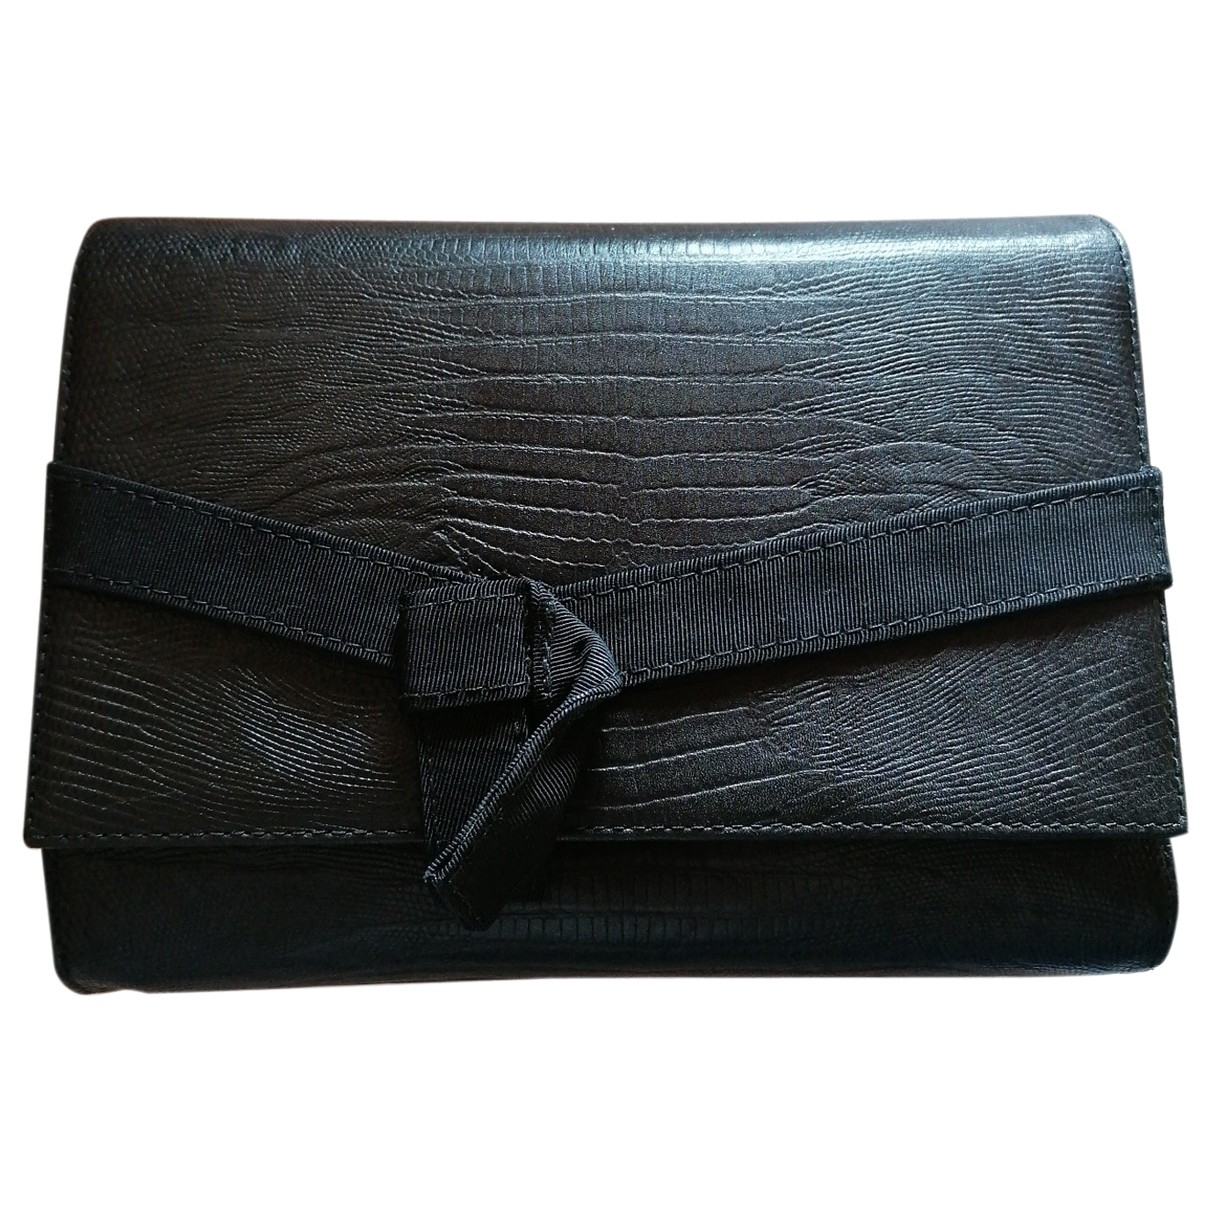 Gianni Versace \N Clutch in  Schwarz Leder